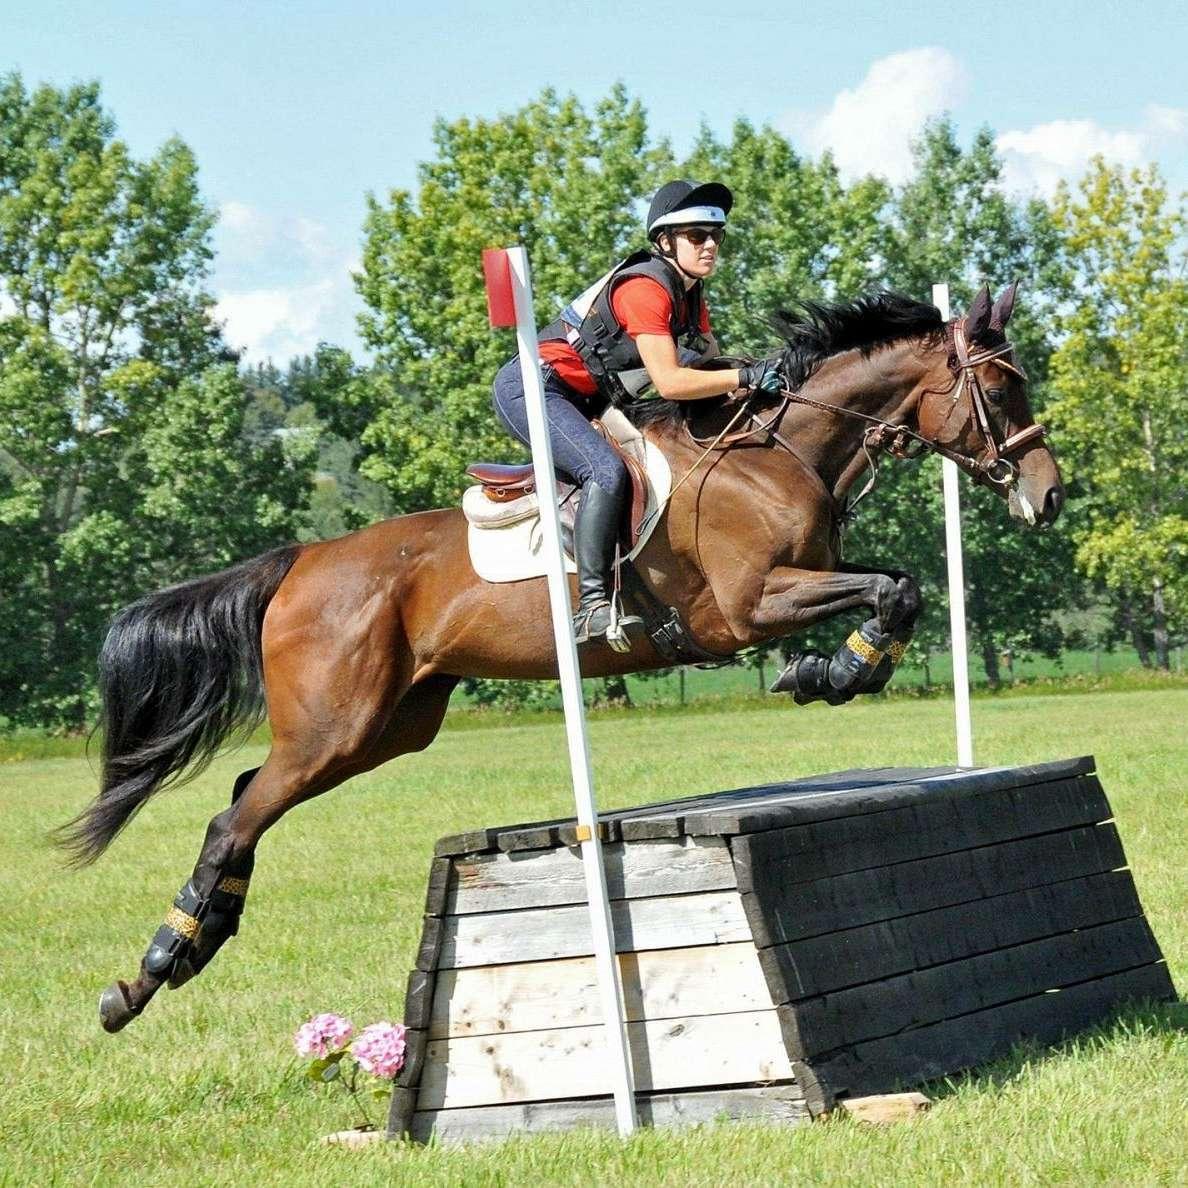 RockStar Perfromance Horses